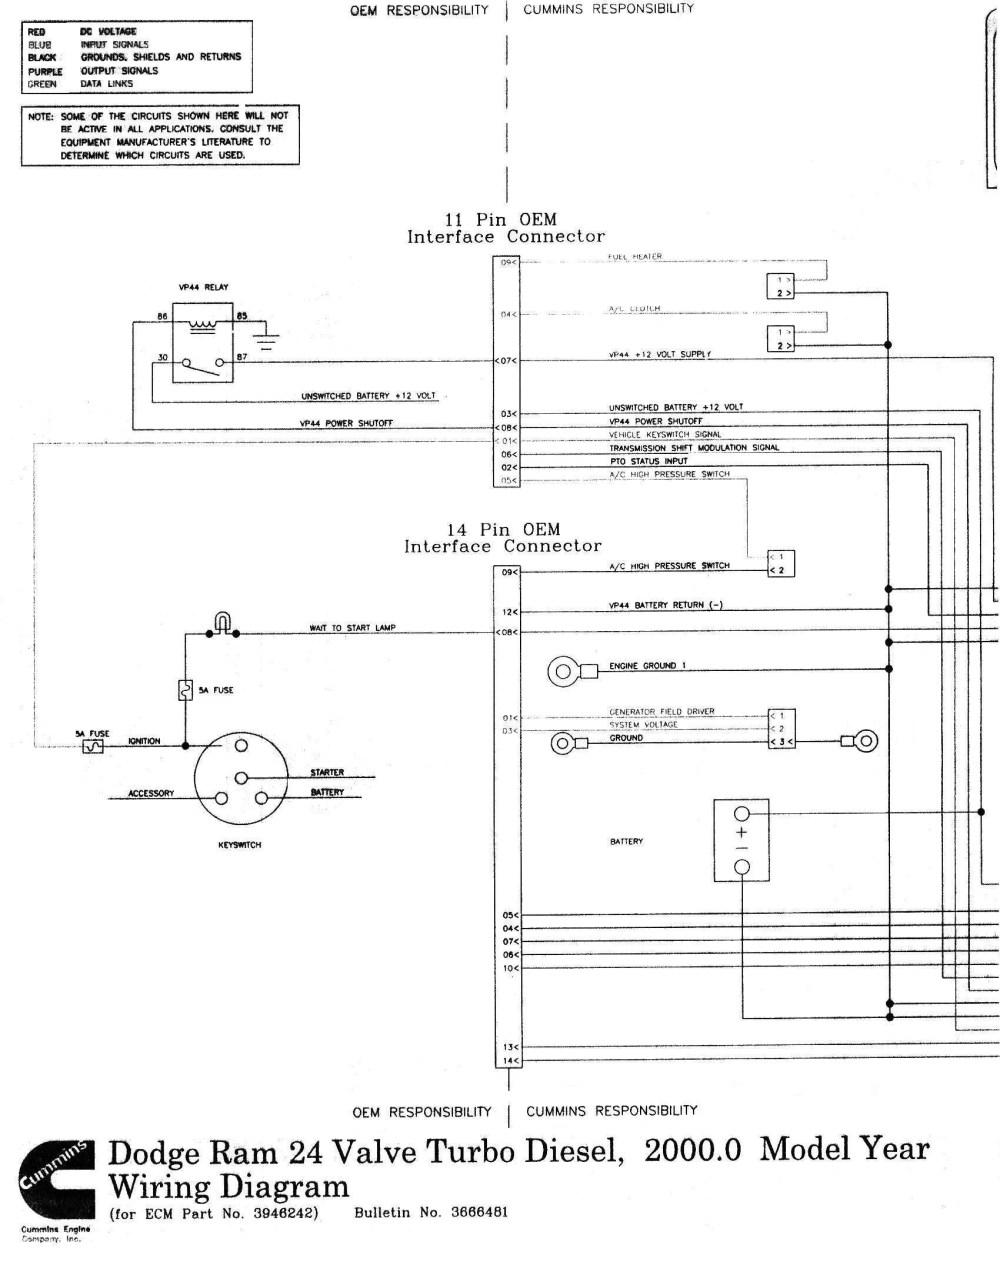 medium resolution of 1998 dodge ram wiring diagram dodge ram oem parts diagram of 1998 dodge ram wiring diagram